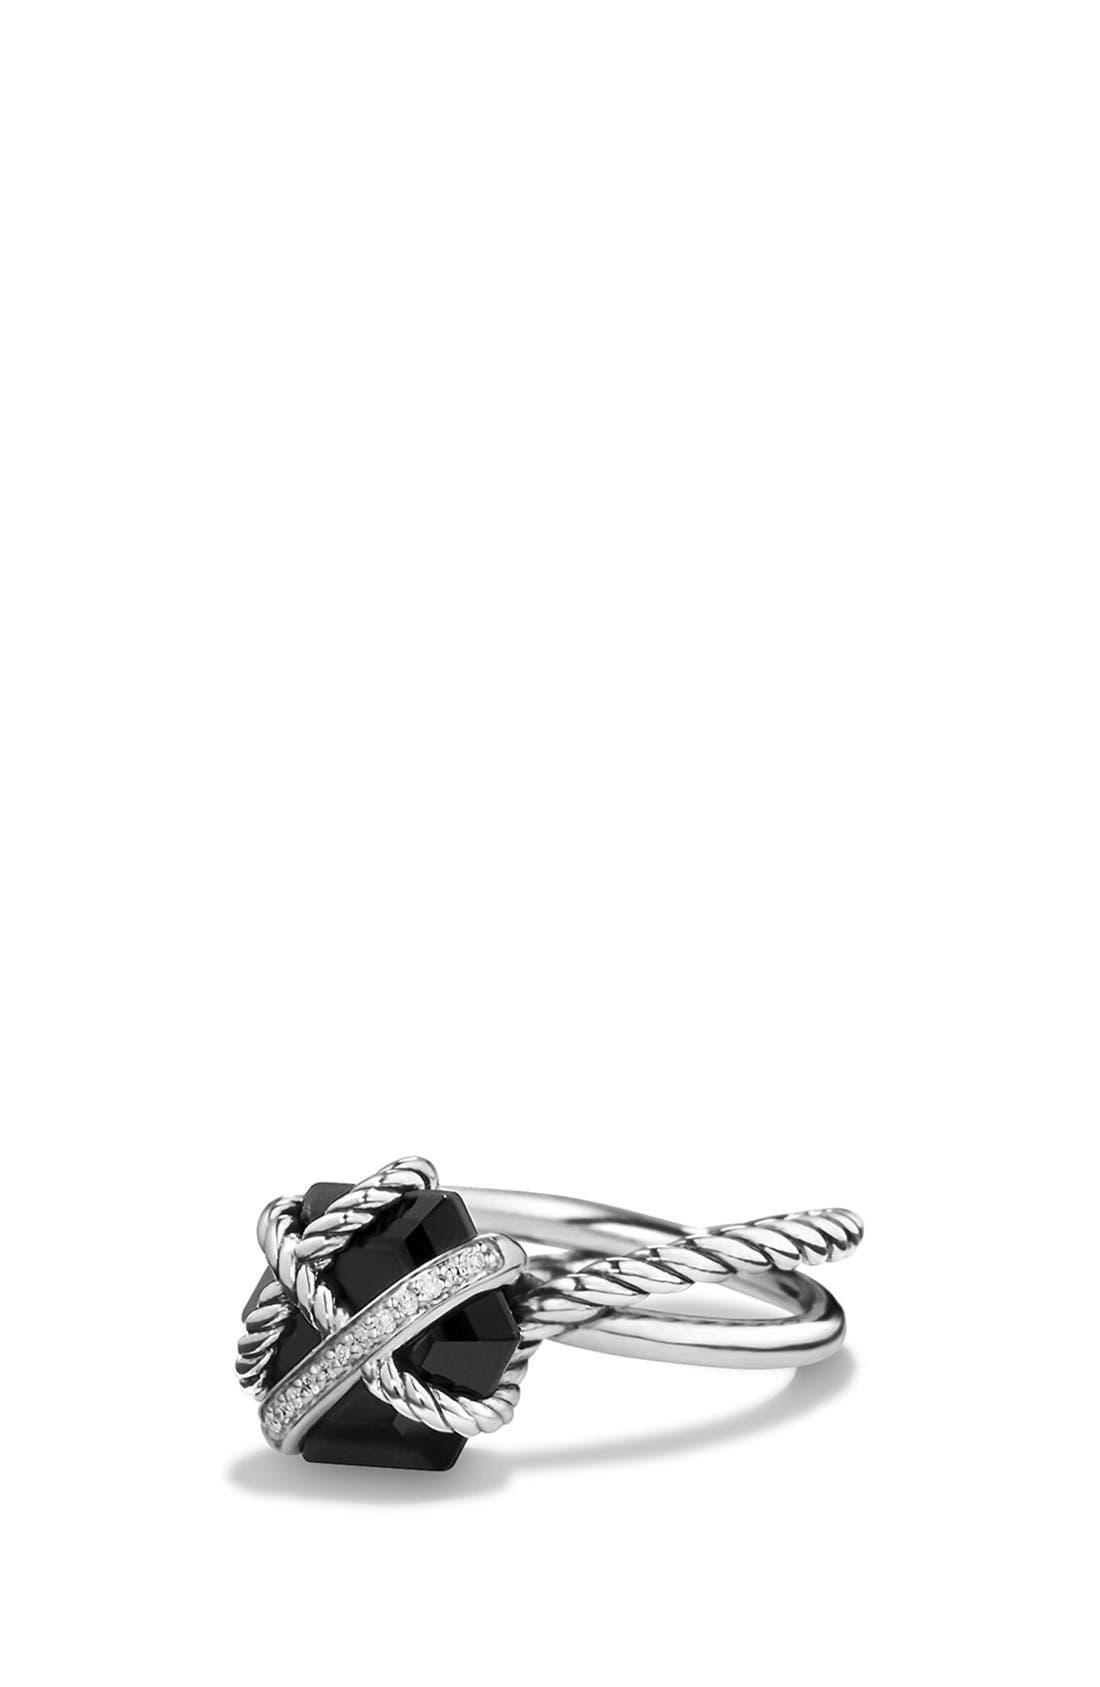 DAVID YURMAN Cable Wrap Ring with Semiprecious Stone andDiamonds, Main, color, BLACK ONYX